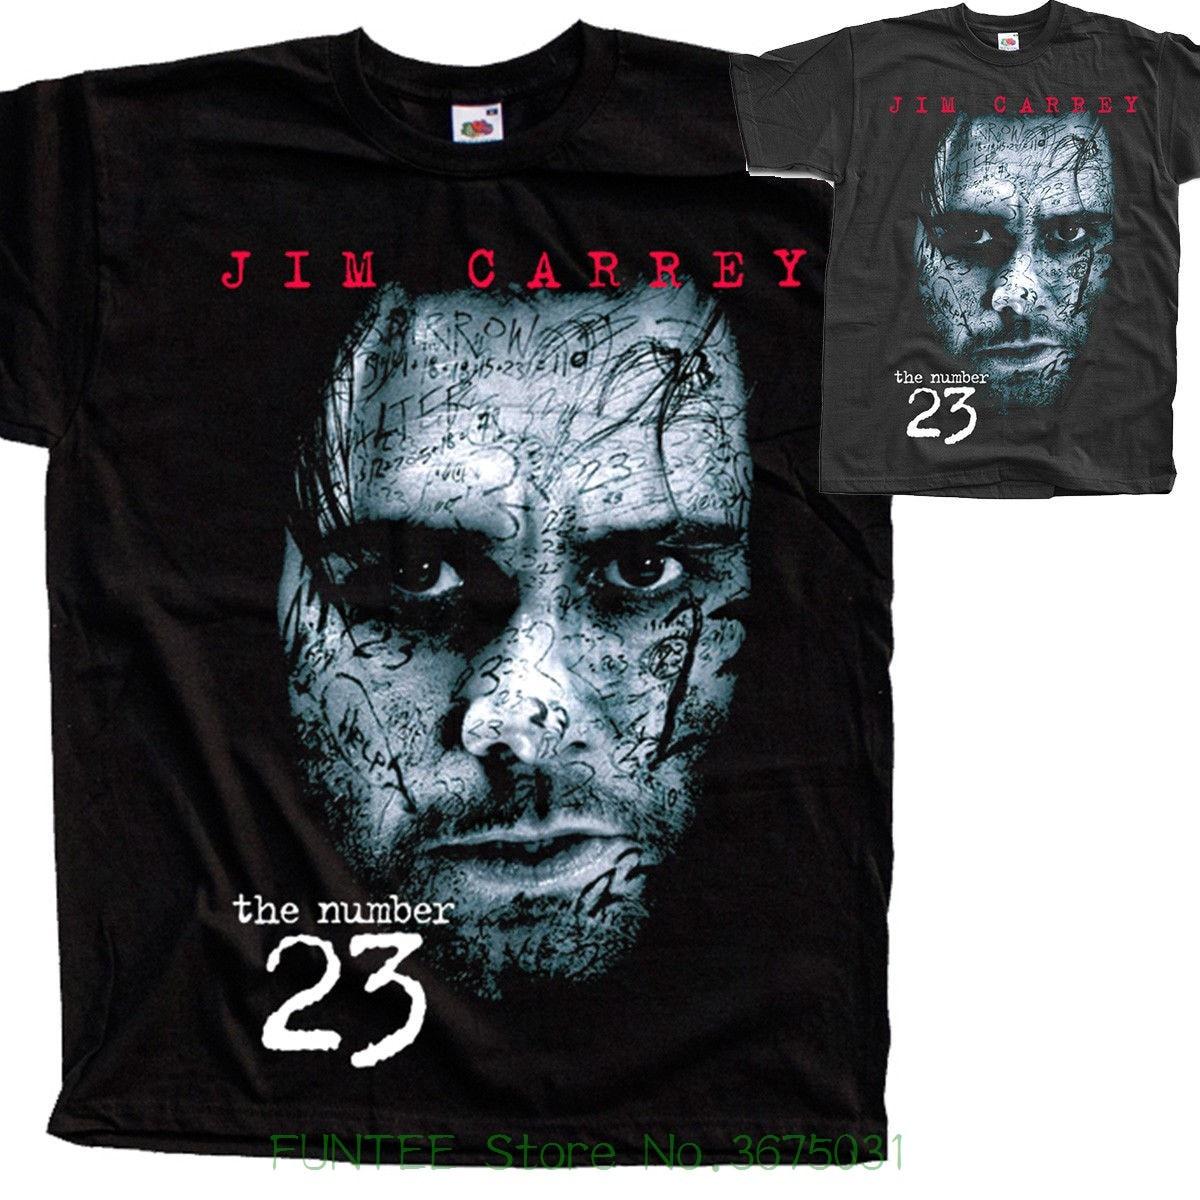 dbae4b8b6 New Man Design T-shirt Print Number 23 V1 , Movie Poster , T Shirt Black  Graphite All Sizes S To 5xl Jim Carrey